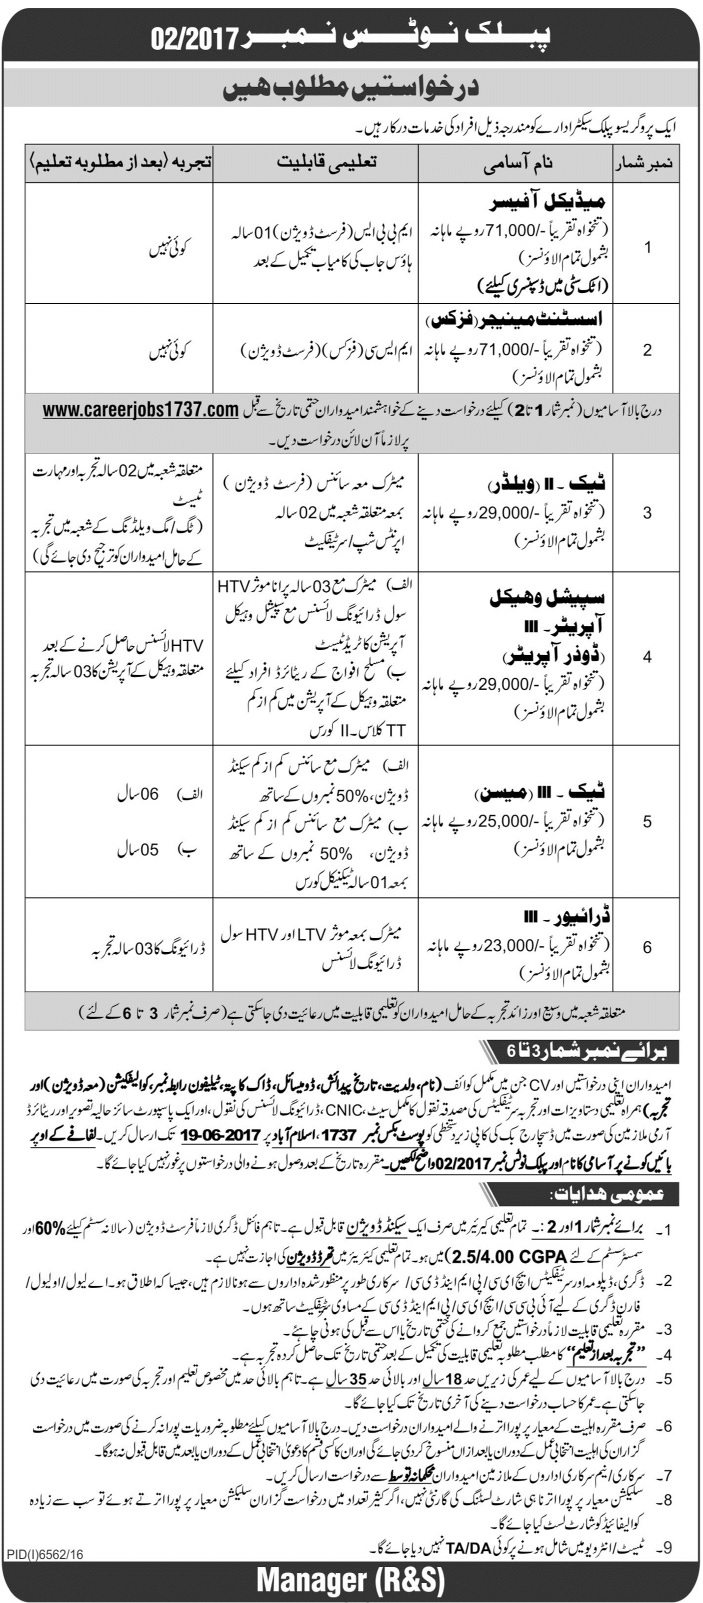 Careerjobs1737.Com Latest Jobs 2017 PO Box No 1737 Islamabad Jobs 2017